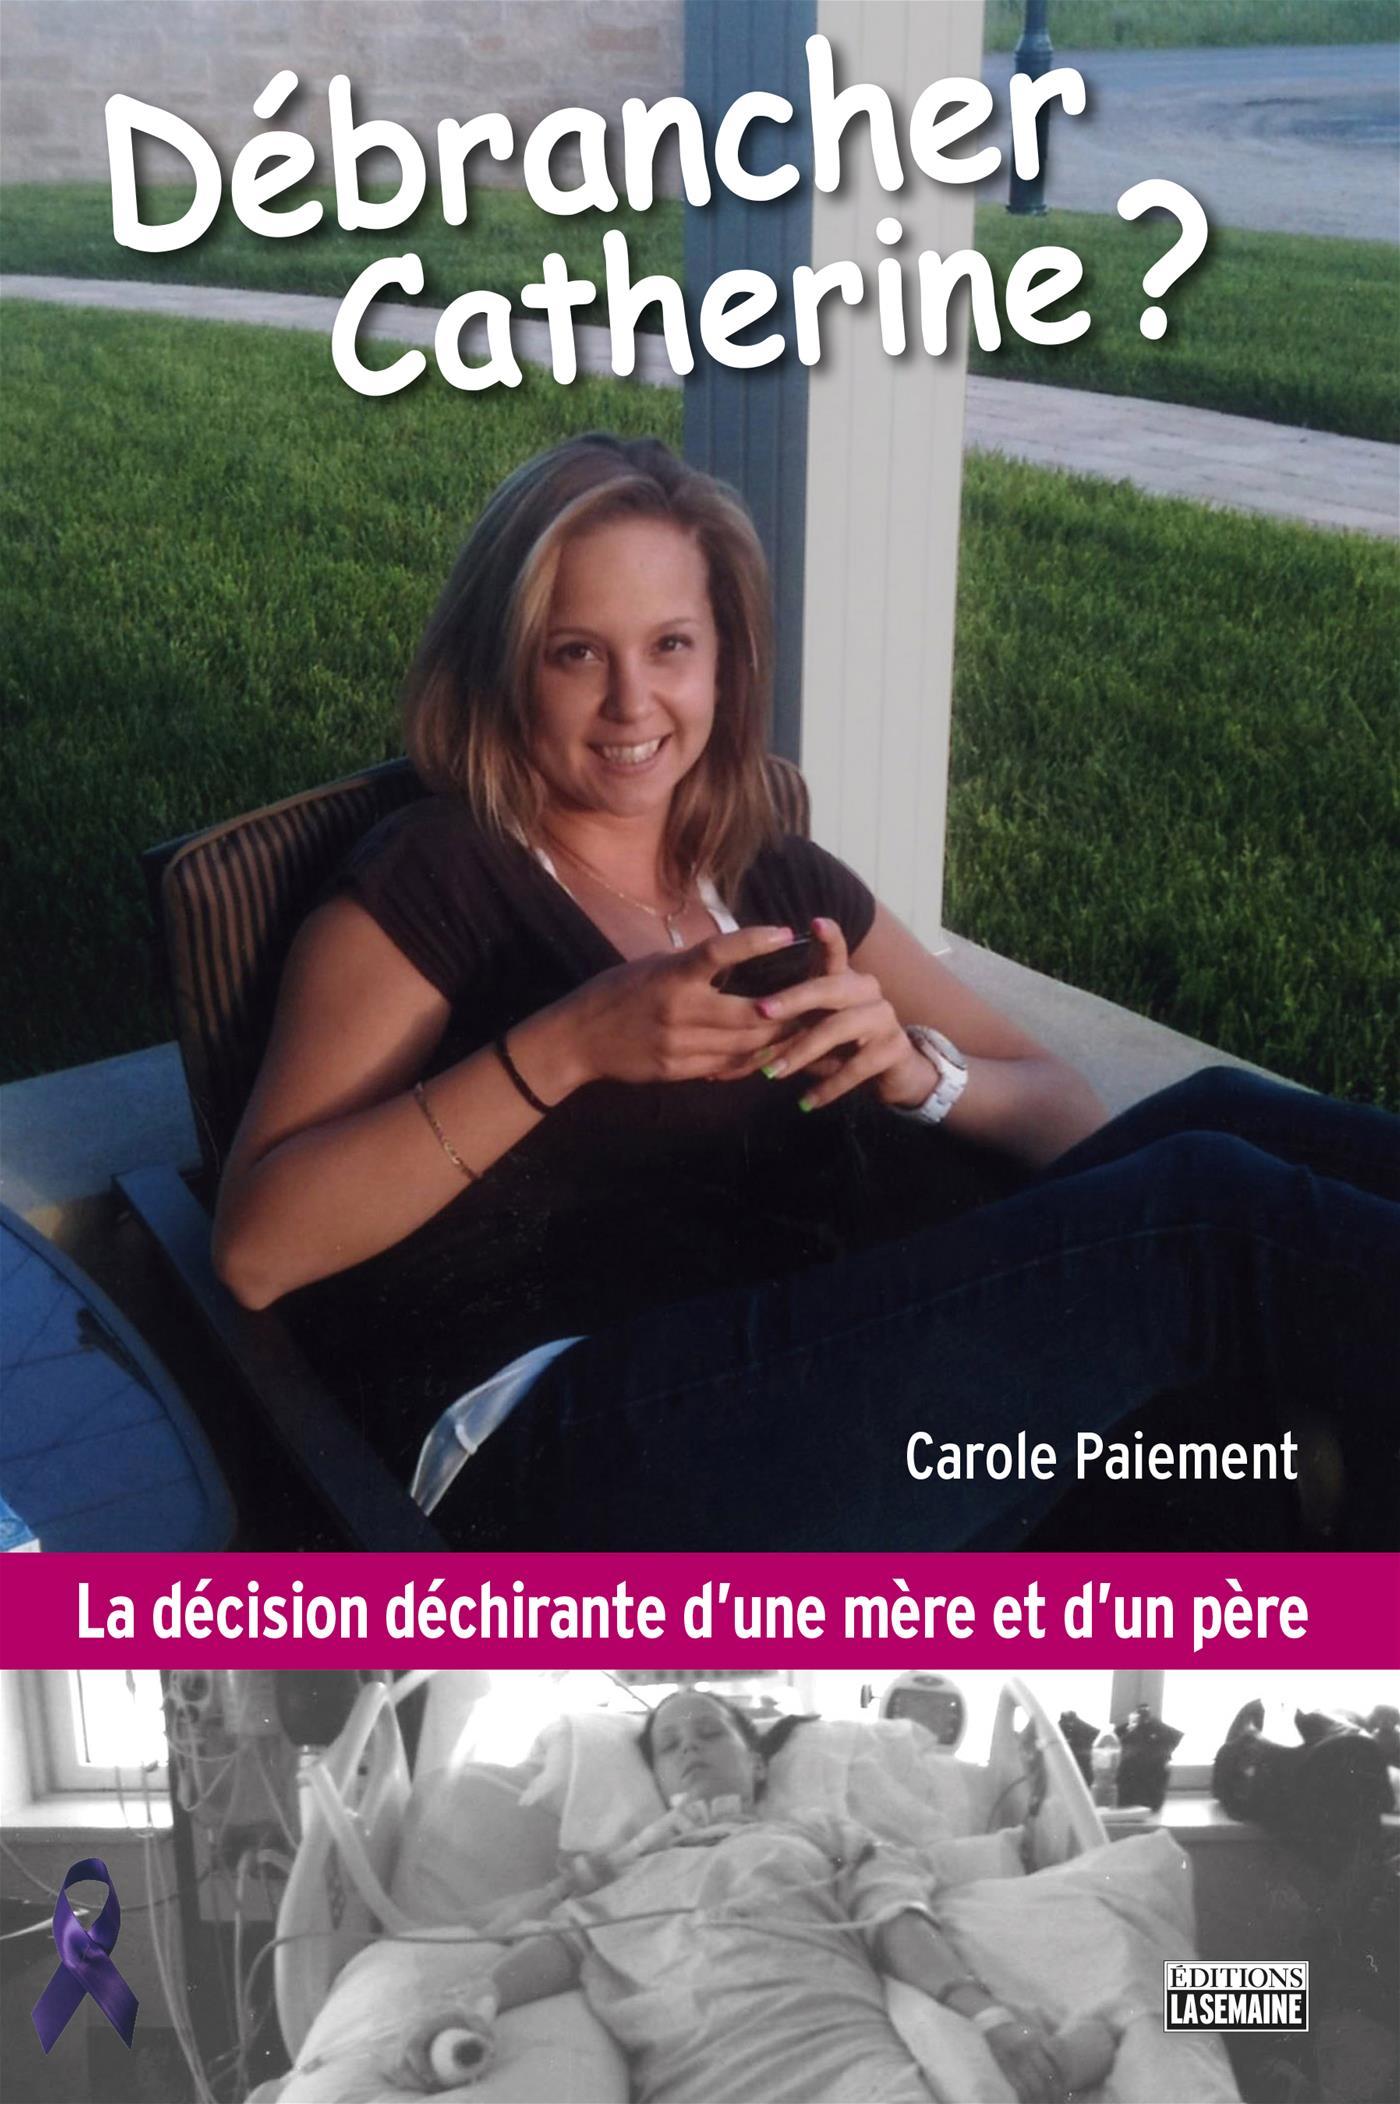 Débrancher Catherine?